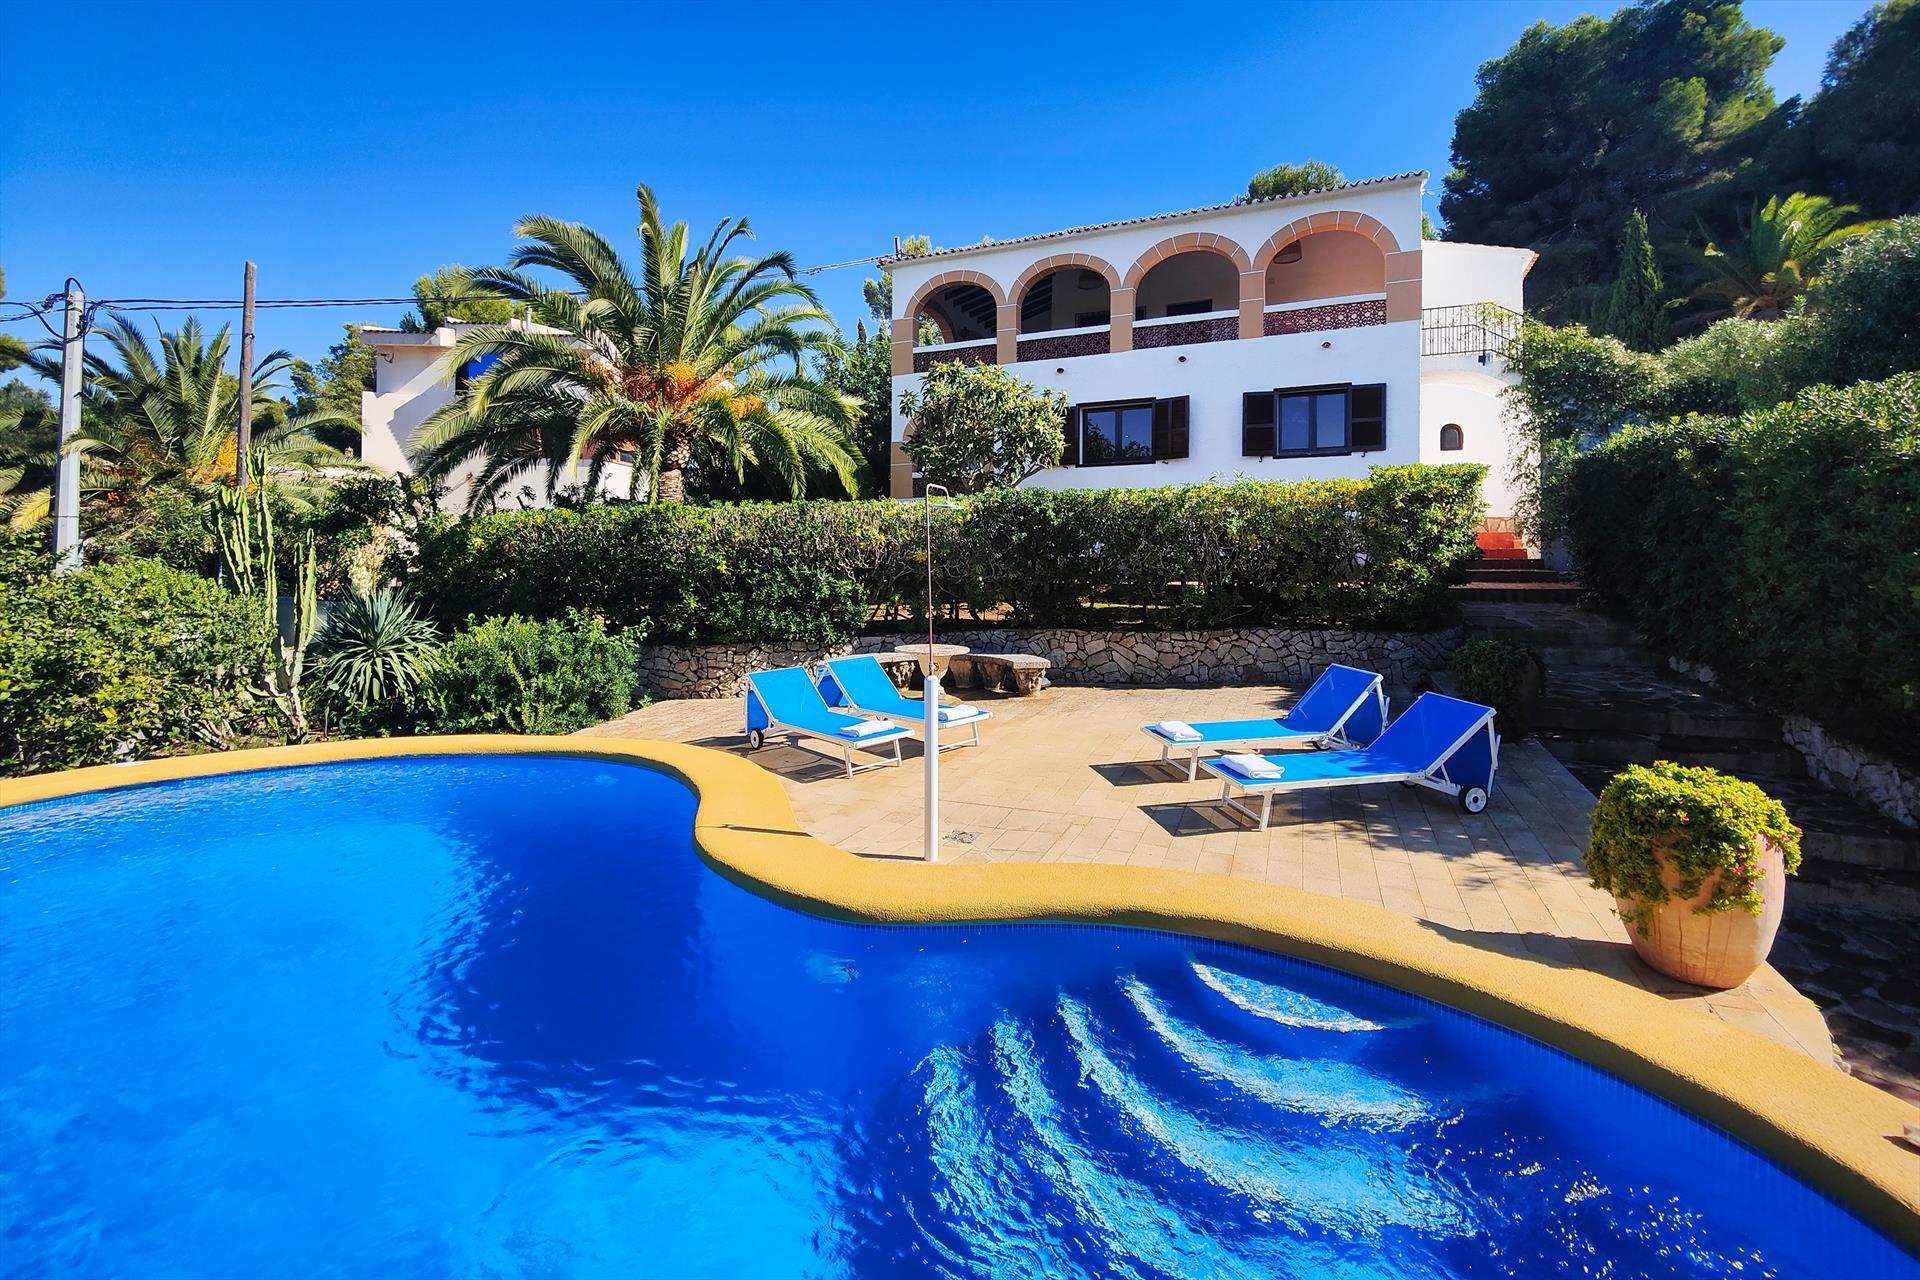 Villa Marta Denia,Rustieke en klassieke villa in Denia, aan de Costa Blanca, Spanje met privé zwembad voor 6-7 personen. De vakantievilla.....